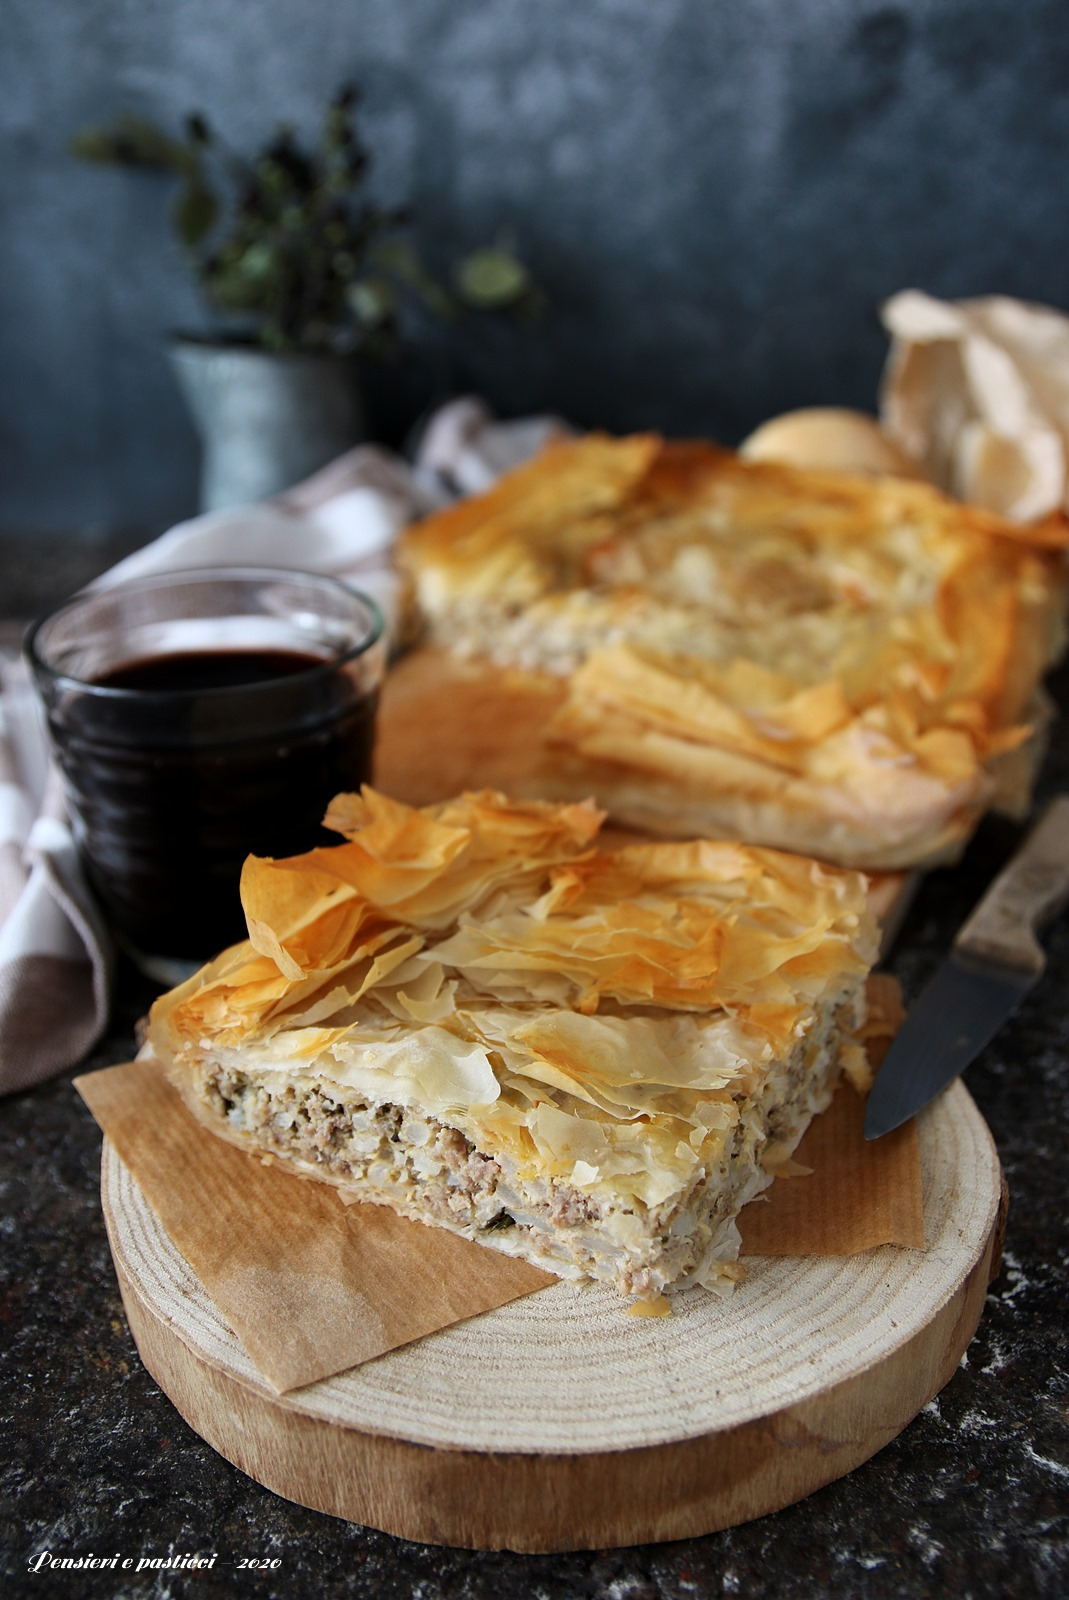 lakror albanese per san basilio